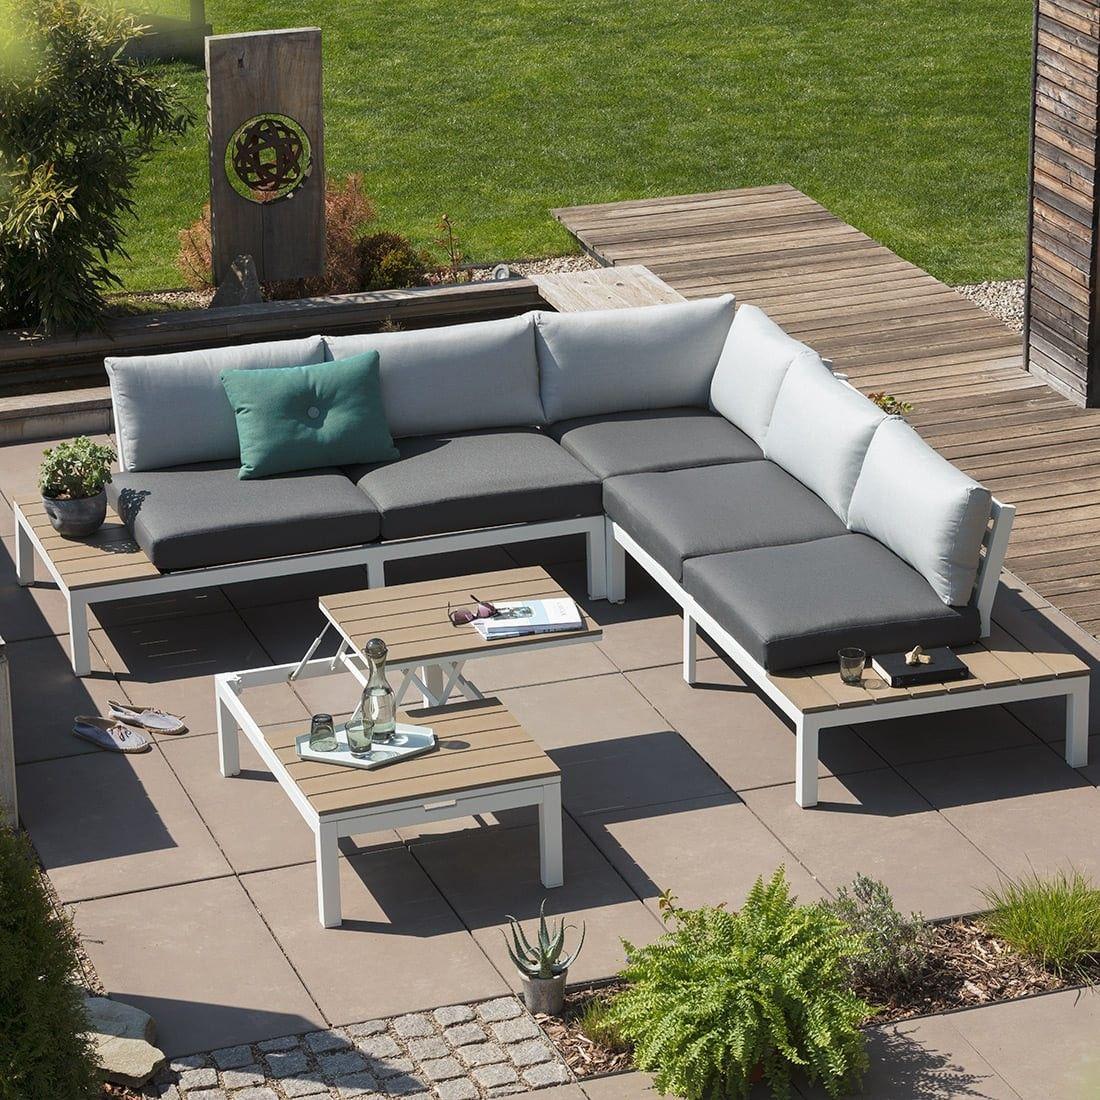 Image Result For Gartenmobel Outdoor Lounge Mobel Gartenmobel Lounge Set Lounge Mobel